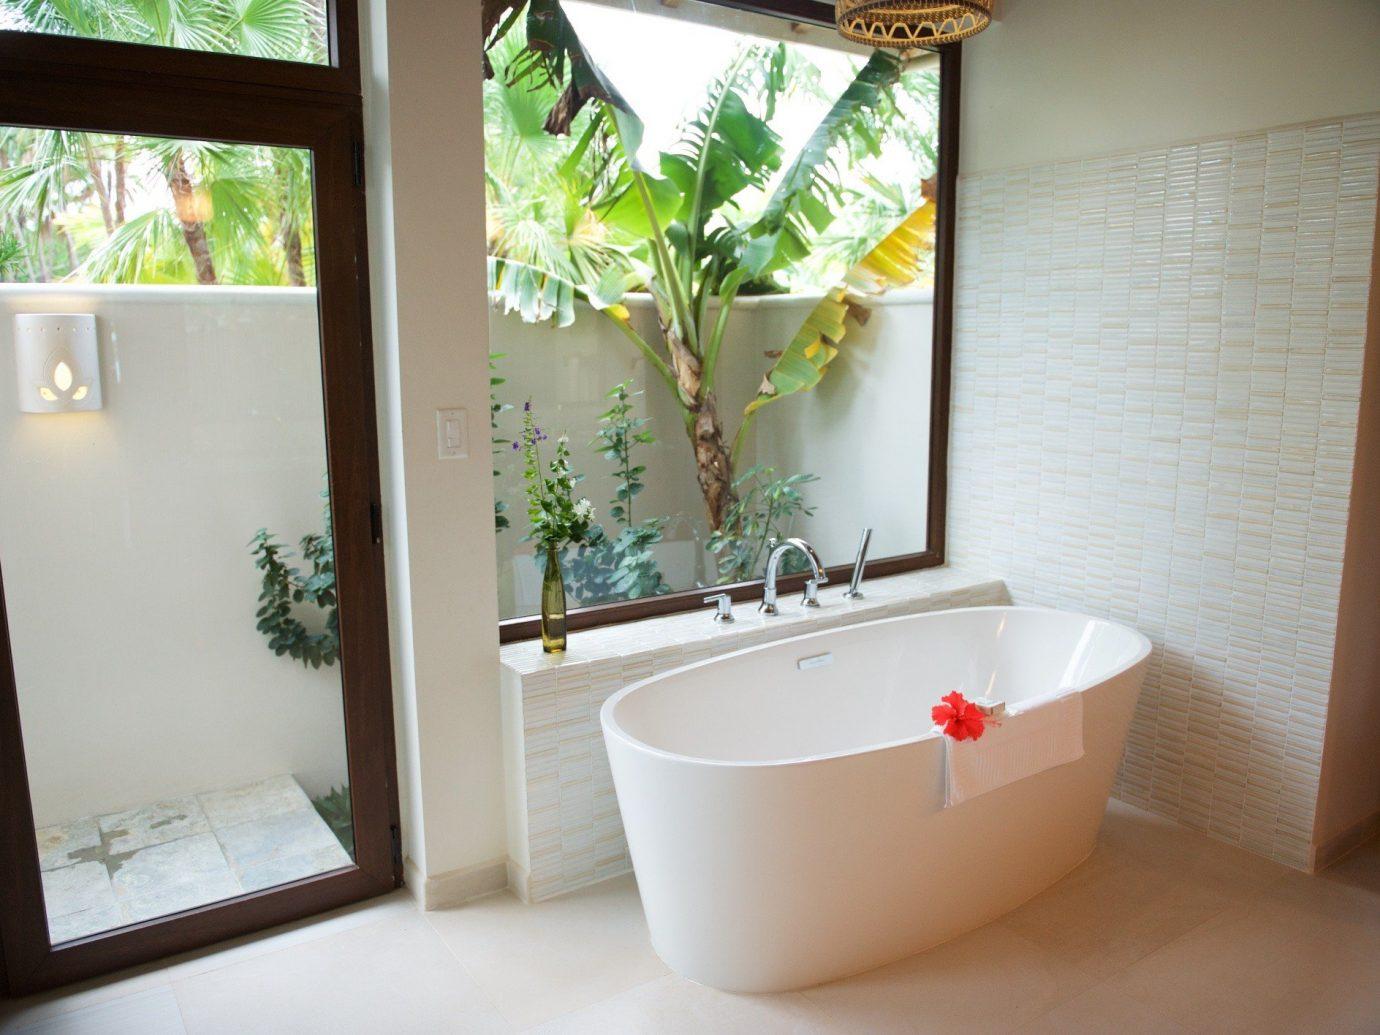 Trip Ideas wall indoor bathroom room window property house bathtub home white interior design plumbing fixture sink Design tub cottage Bath tiled